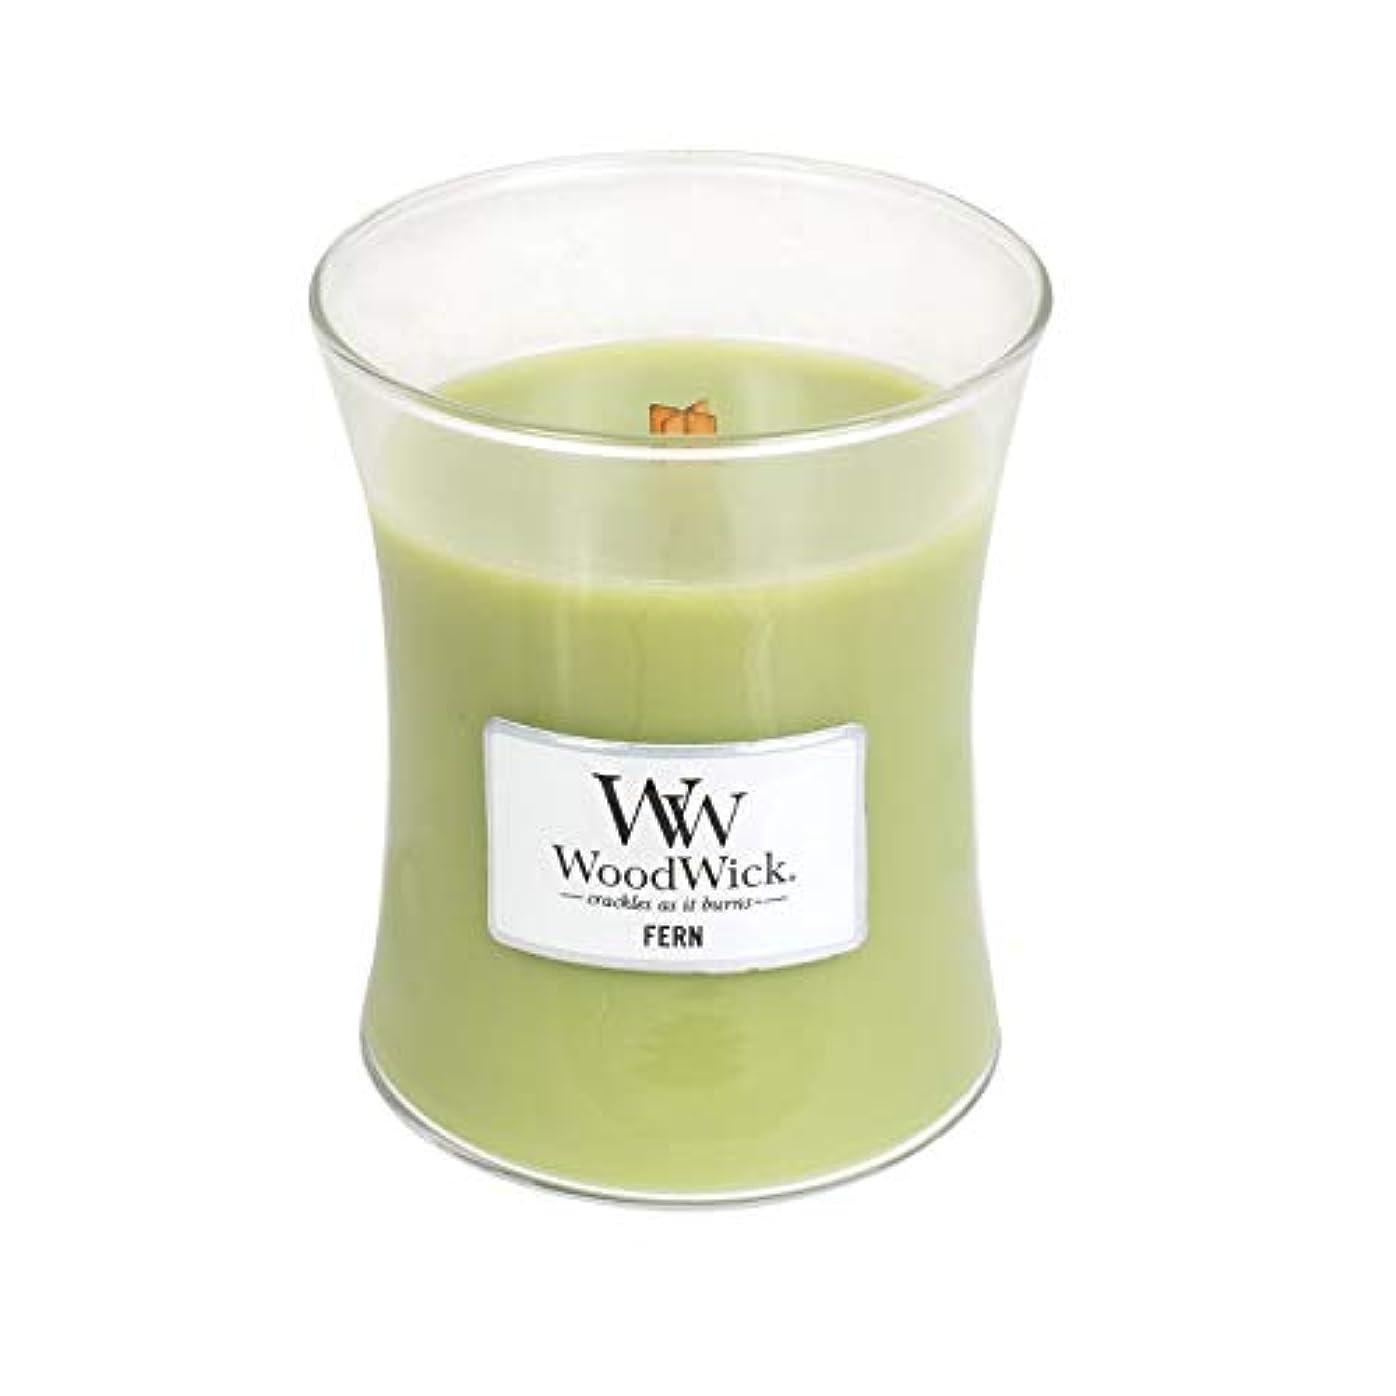 (Medium, Fern) - WoodWick Medium Hourglass Scented Candle, Fern